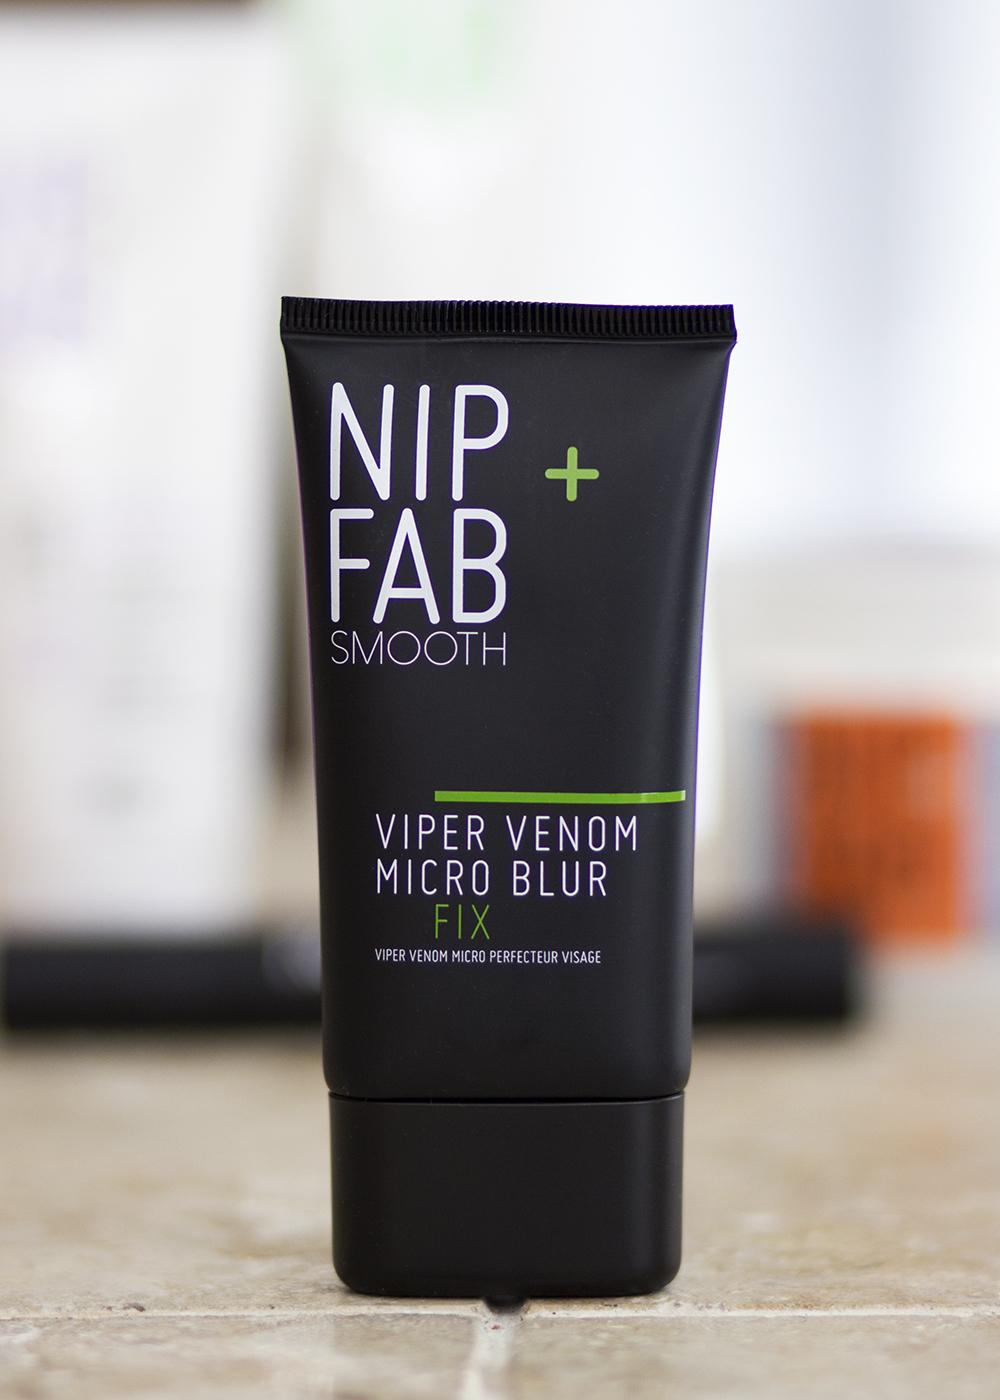 Rodial and Nip + Fab Beauty - Nip + Fab Smooth Viper Venom Micro Blur Fix - Rodial Nip Fab Beauty Review